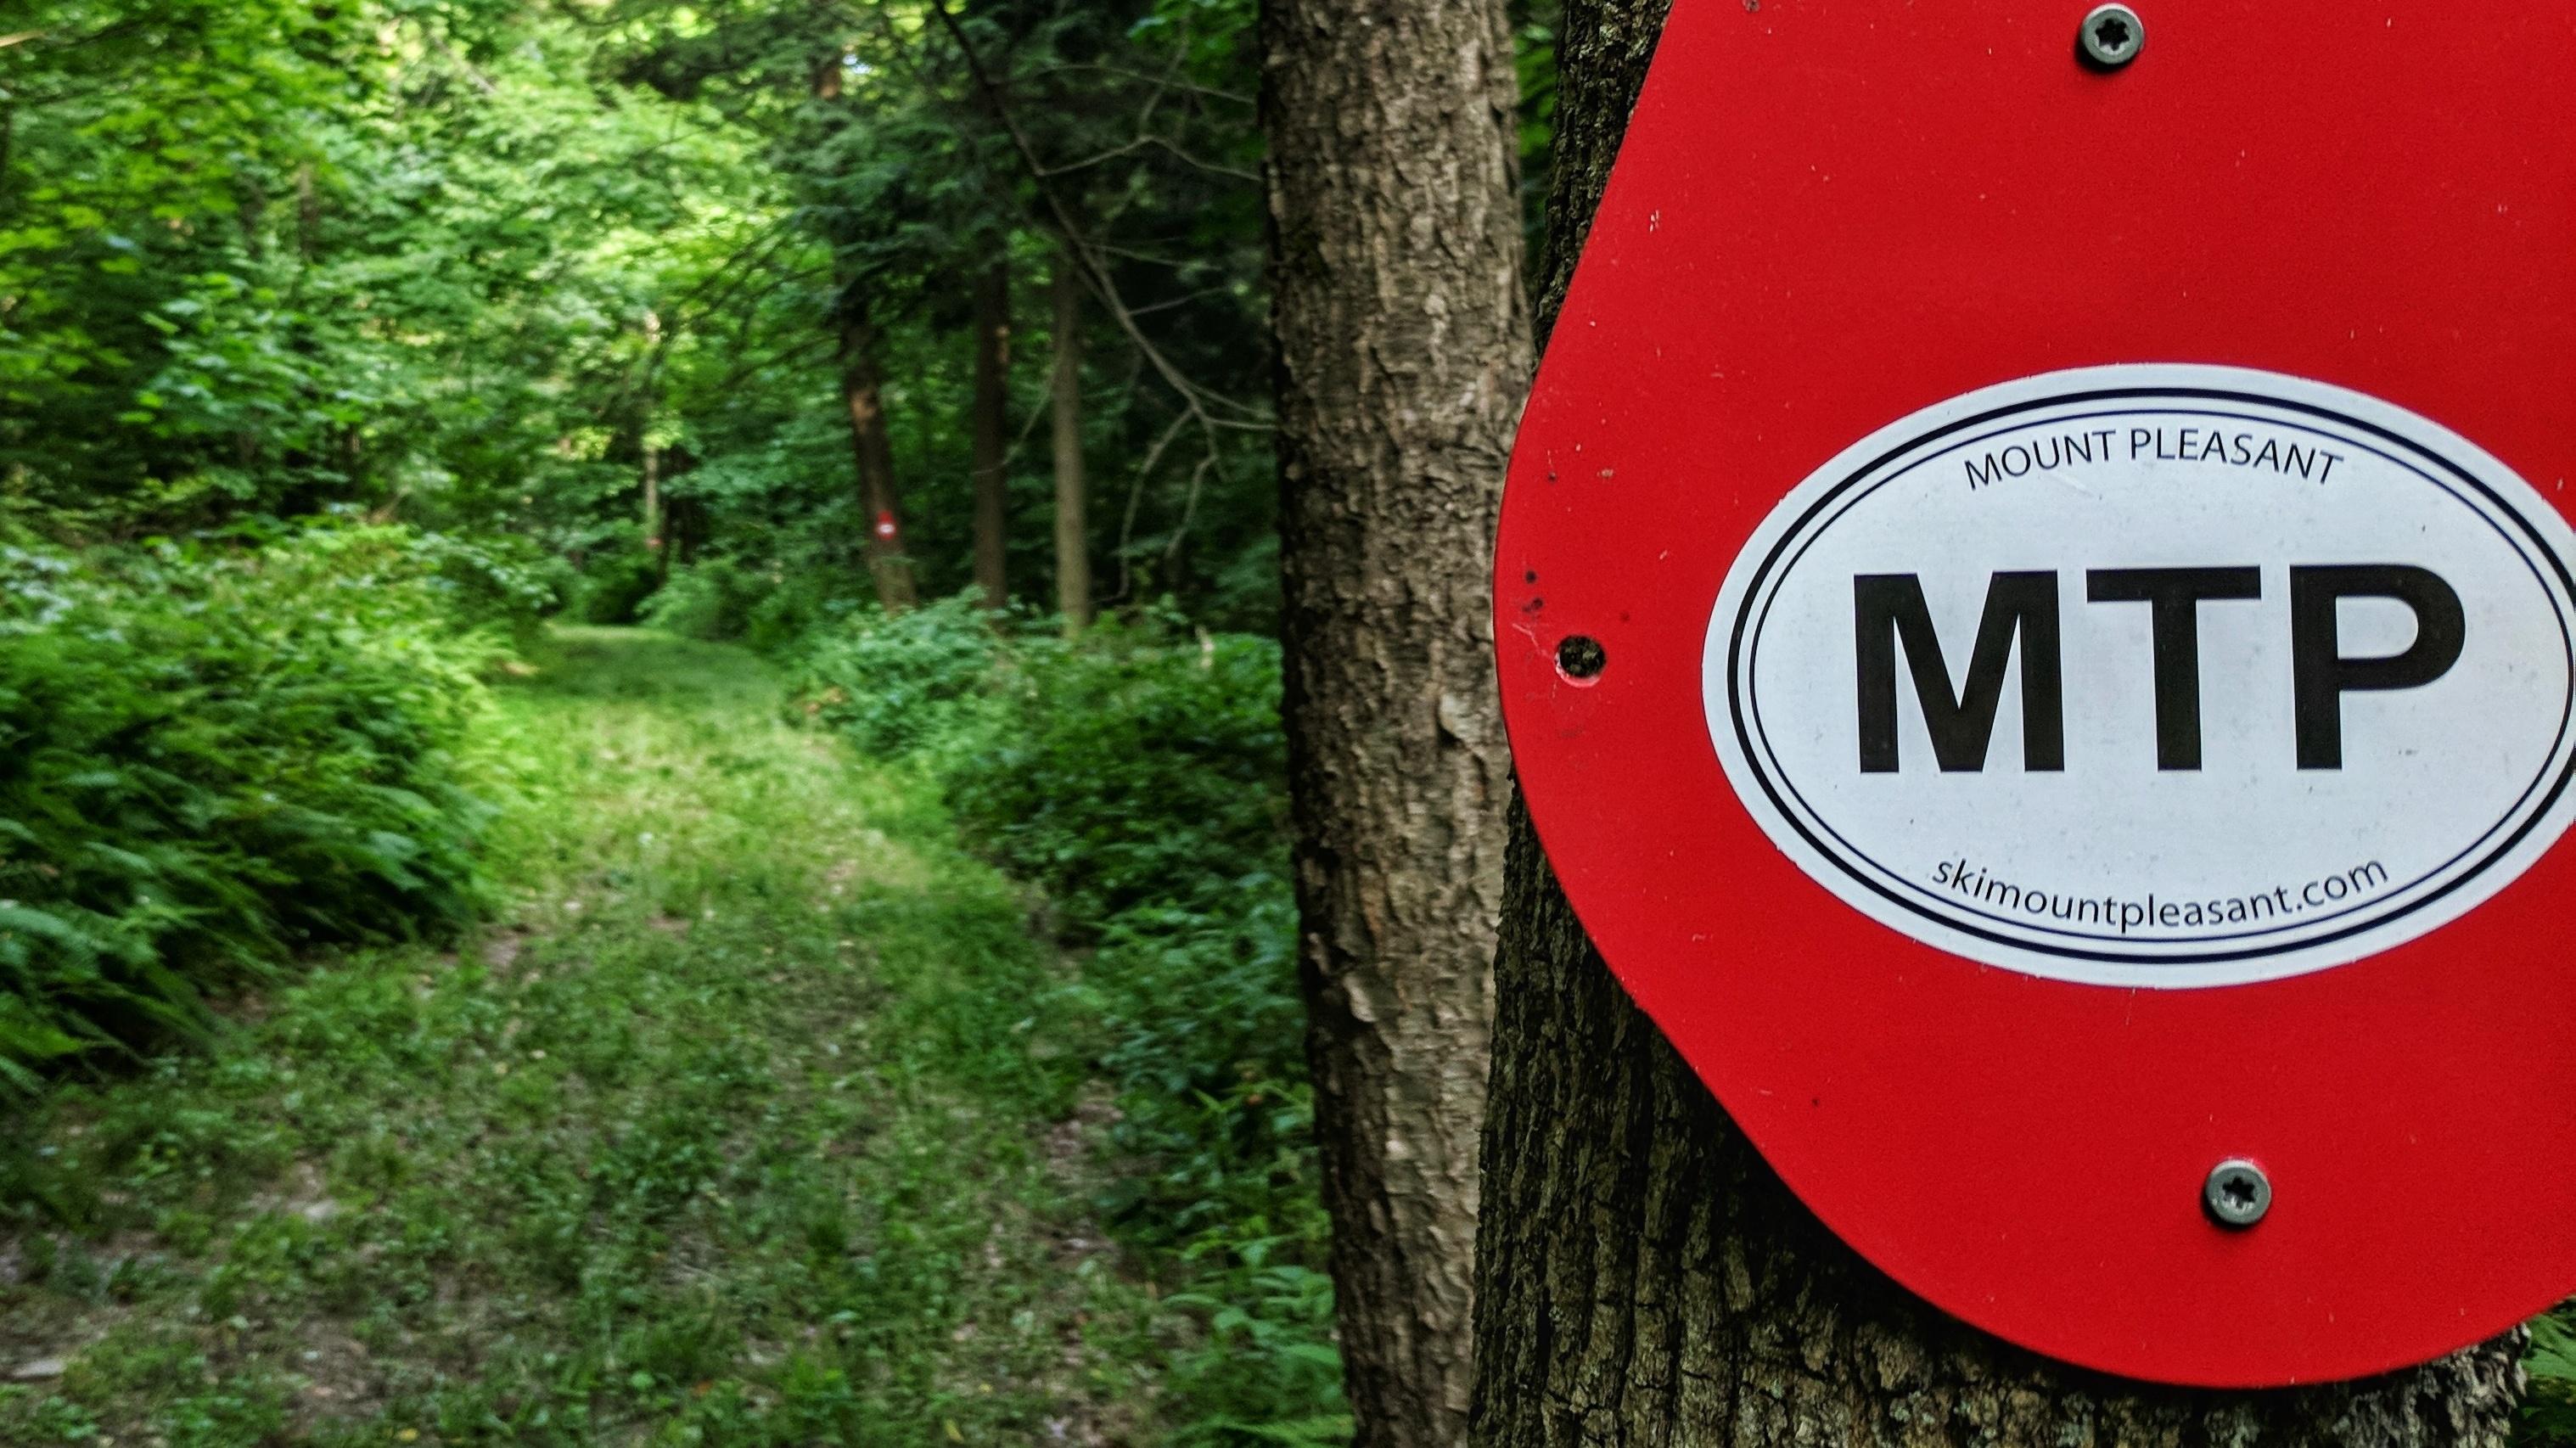 Mount Pleasant Summer Access 4